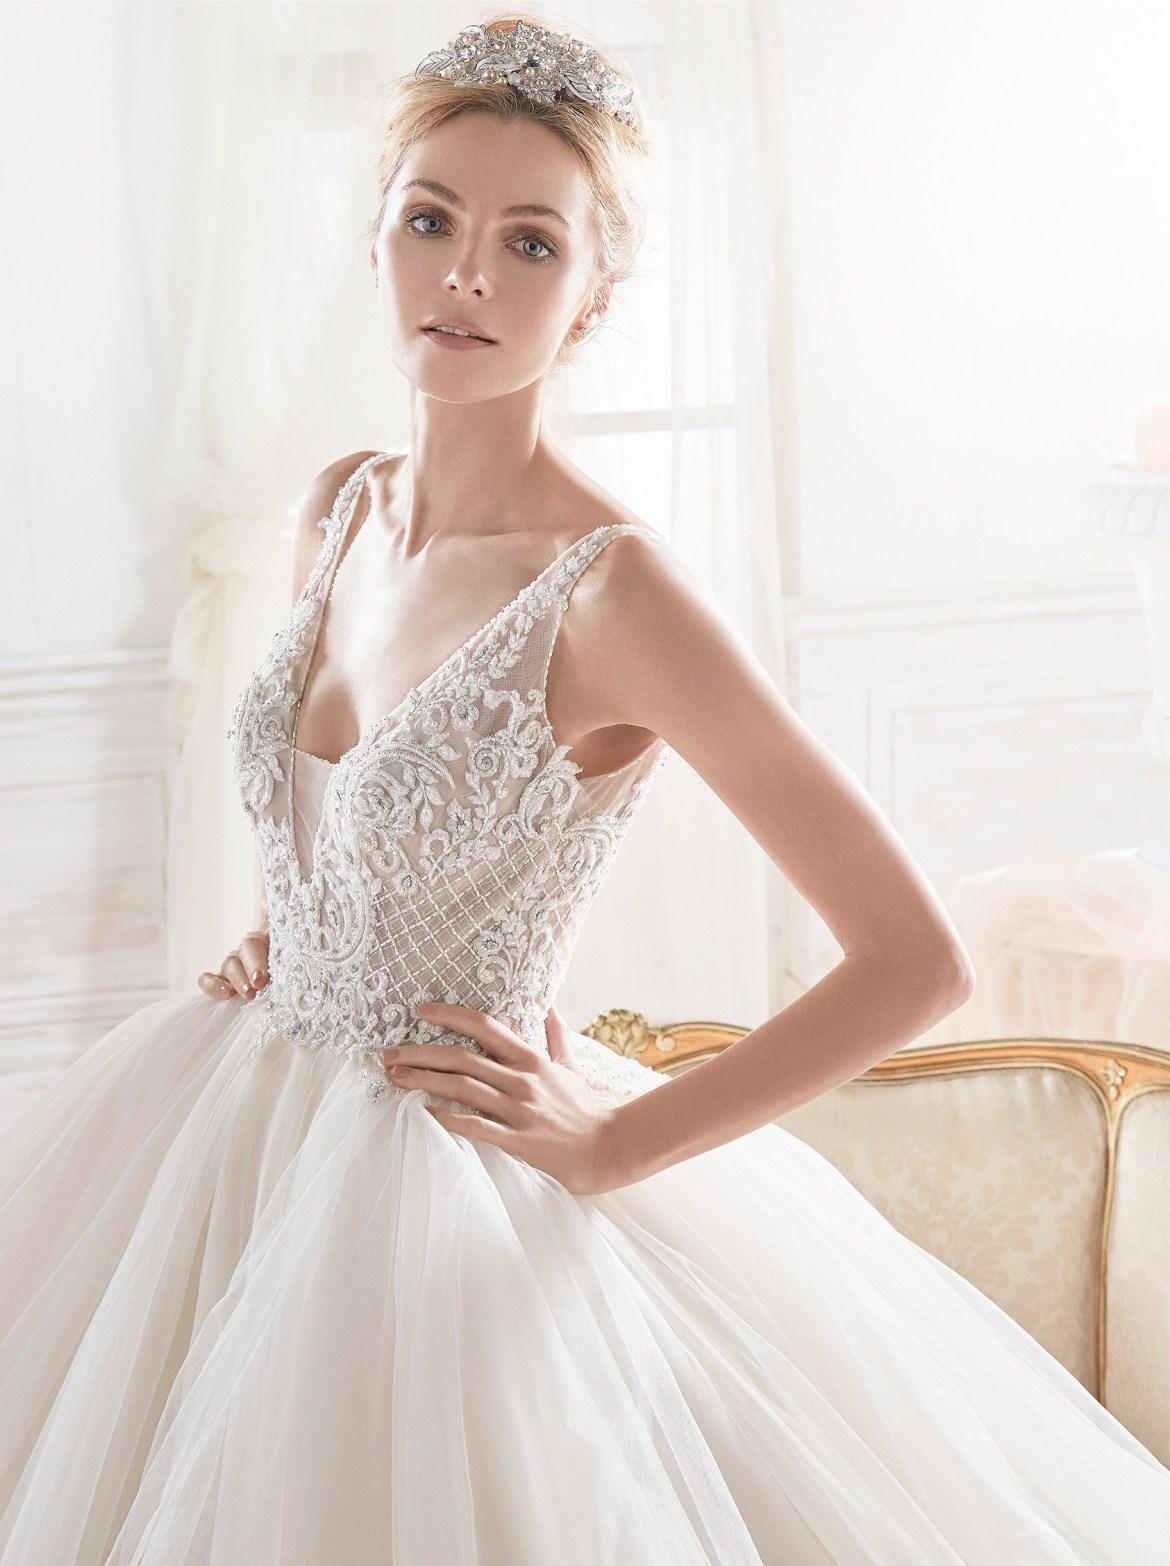 nicole-spose-NIAB18114-Nicole-moda-sposa-2018-102